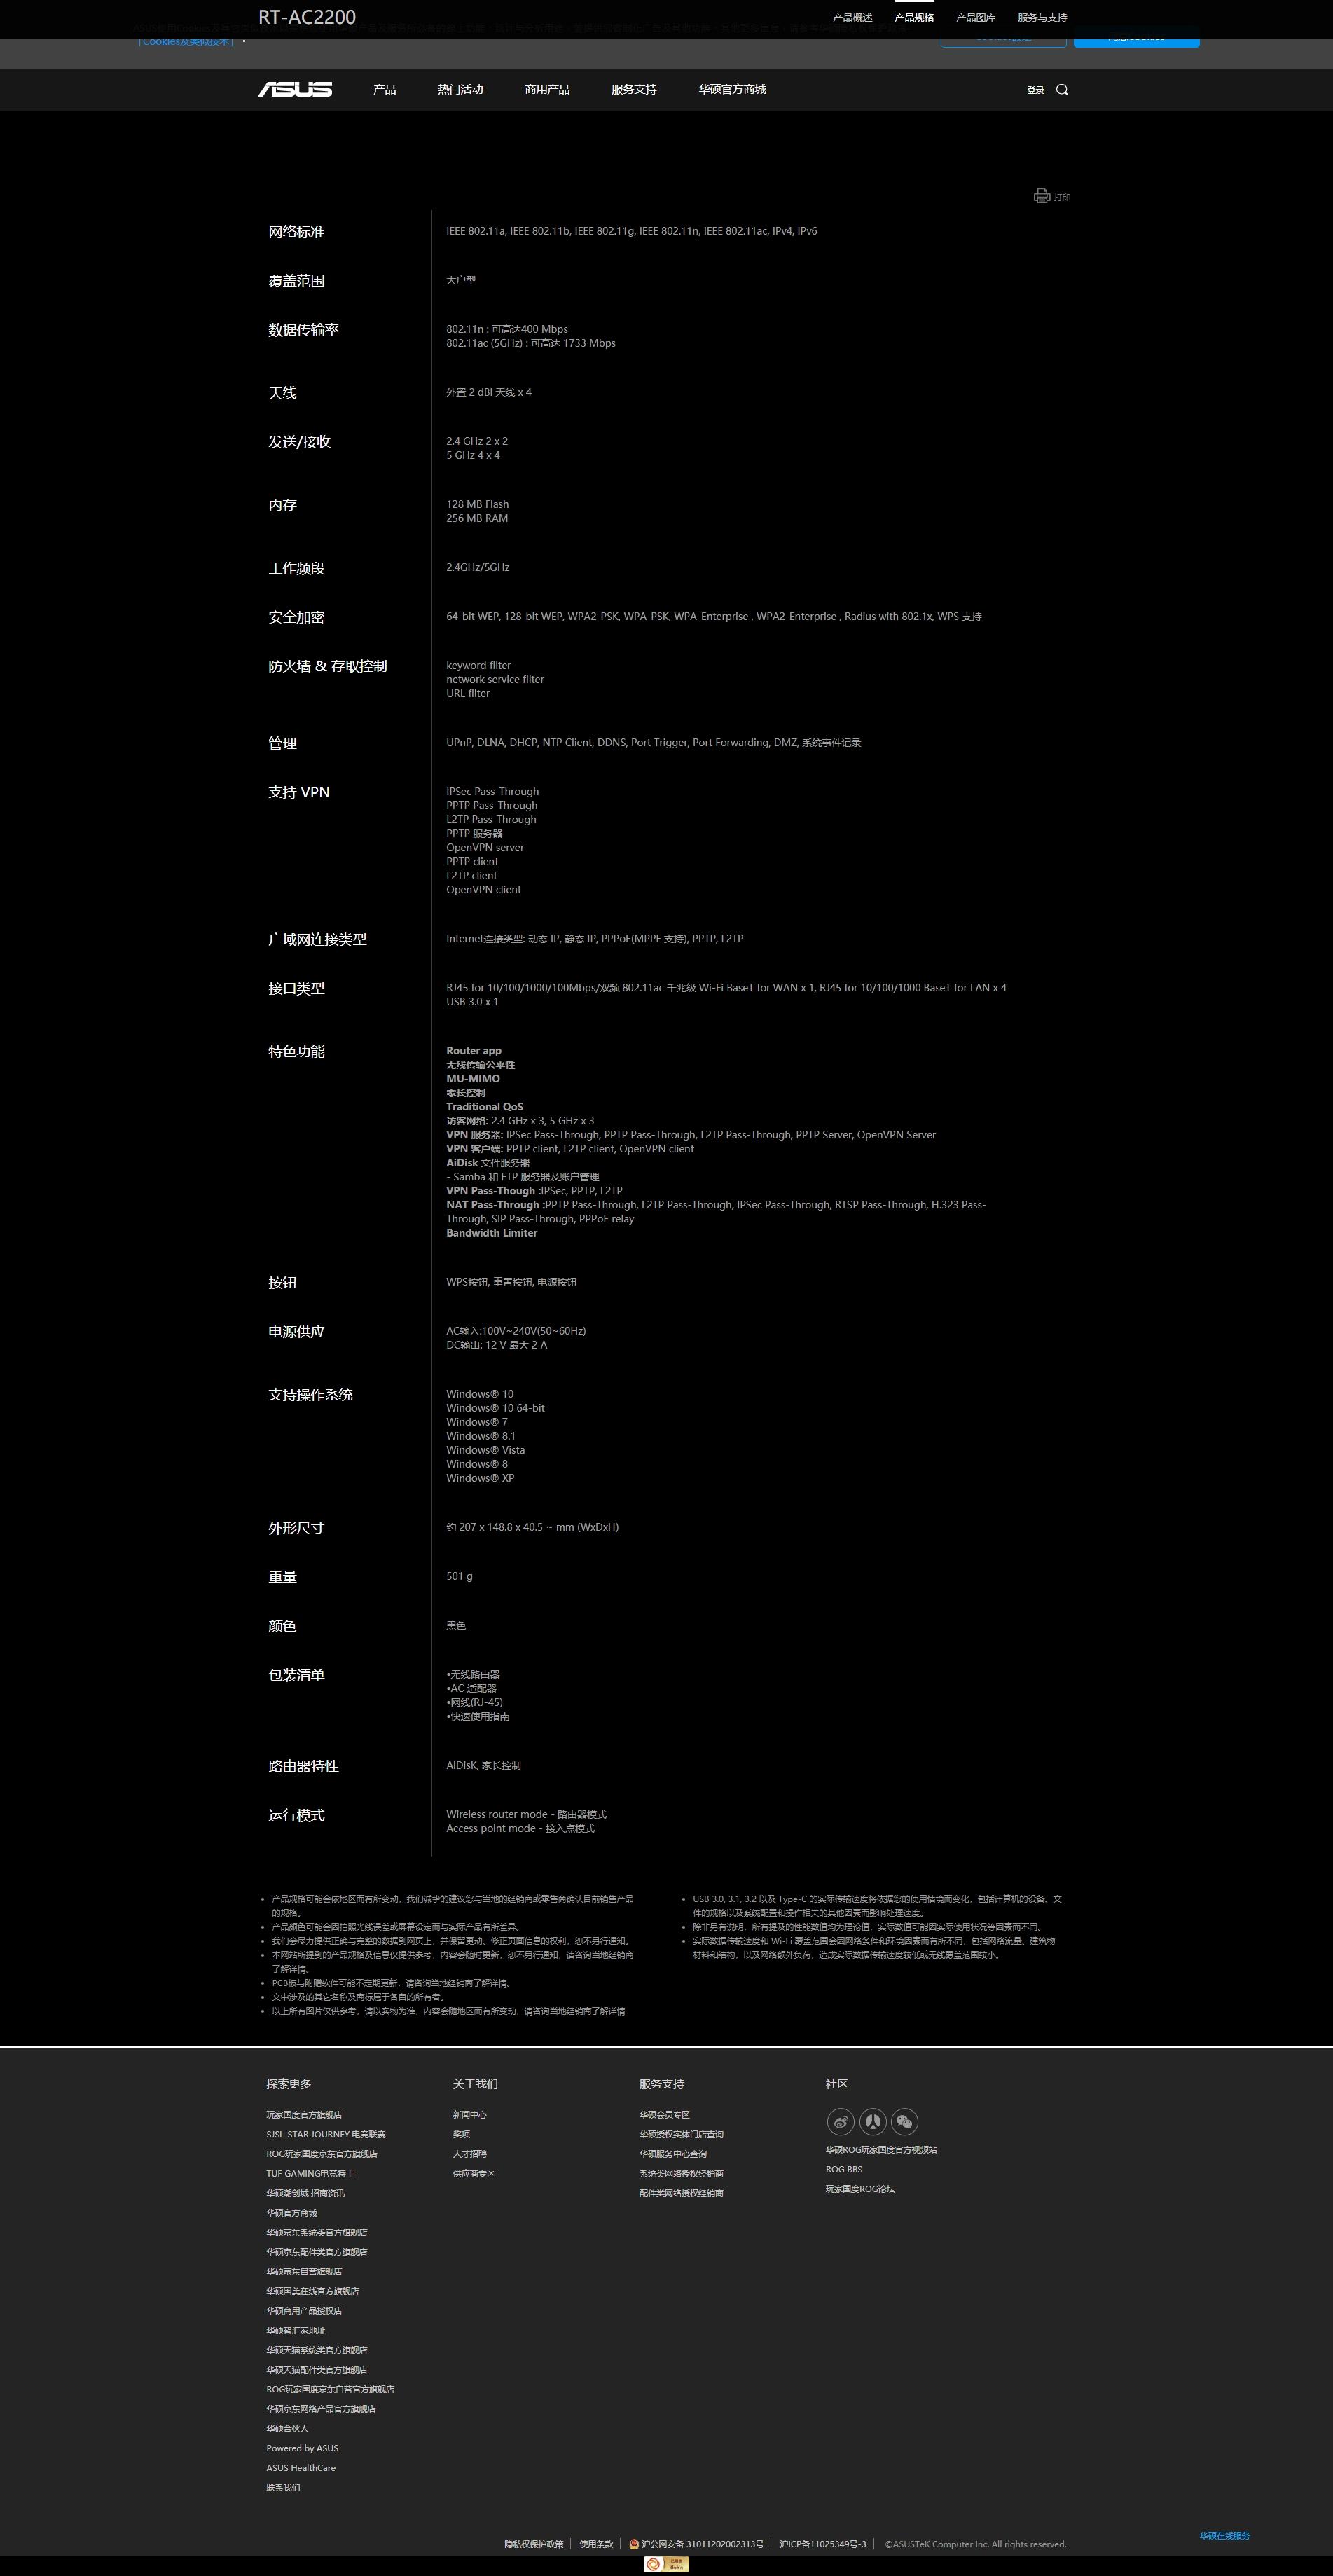 ASUS RT-AC2200